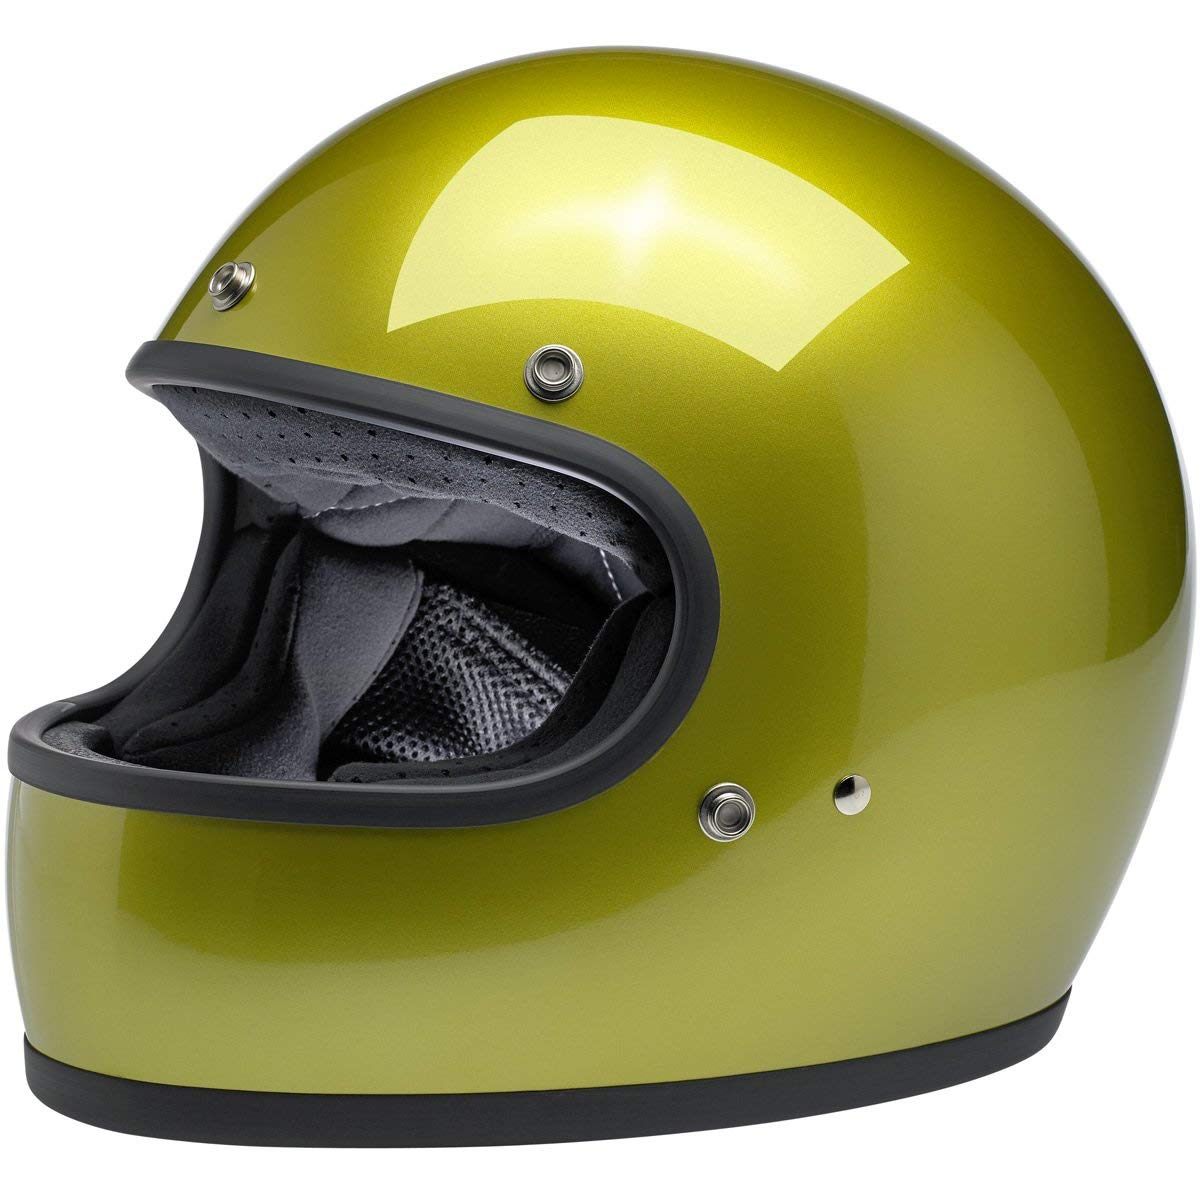 Europa Biltwell Gringo Helm Metallic Sea Weed zugelassen doppelter Zulassung ECE /& DOT Helmet Biker Custom Vintage Retro Anno 70 Gr/ö/ße S America